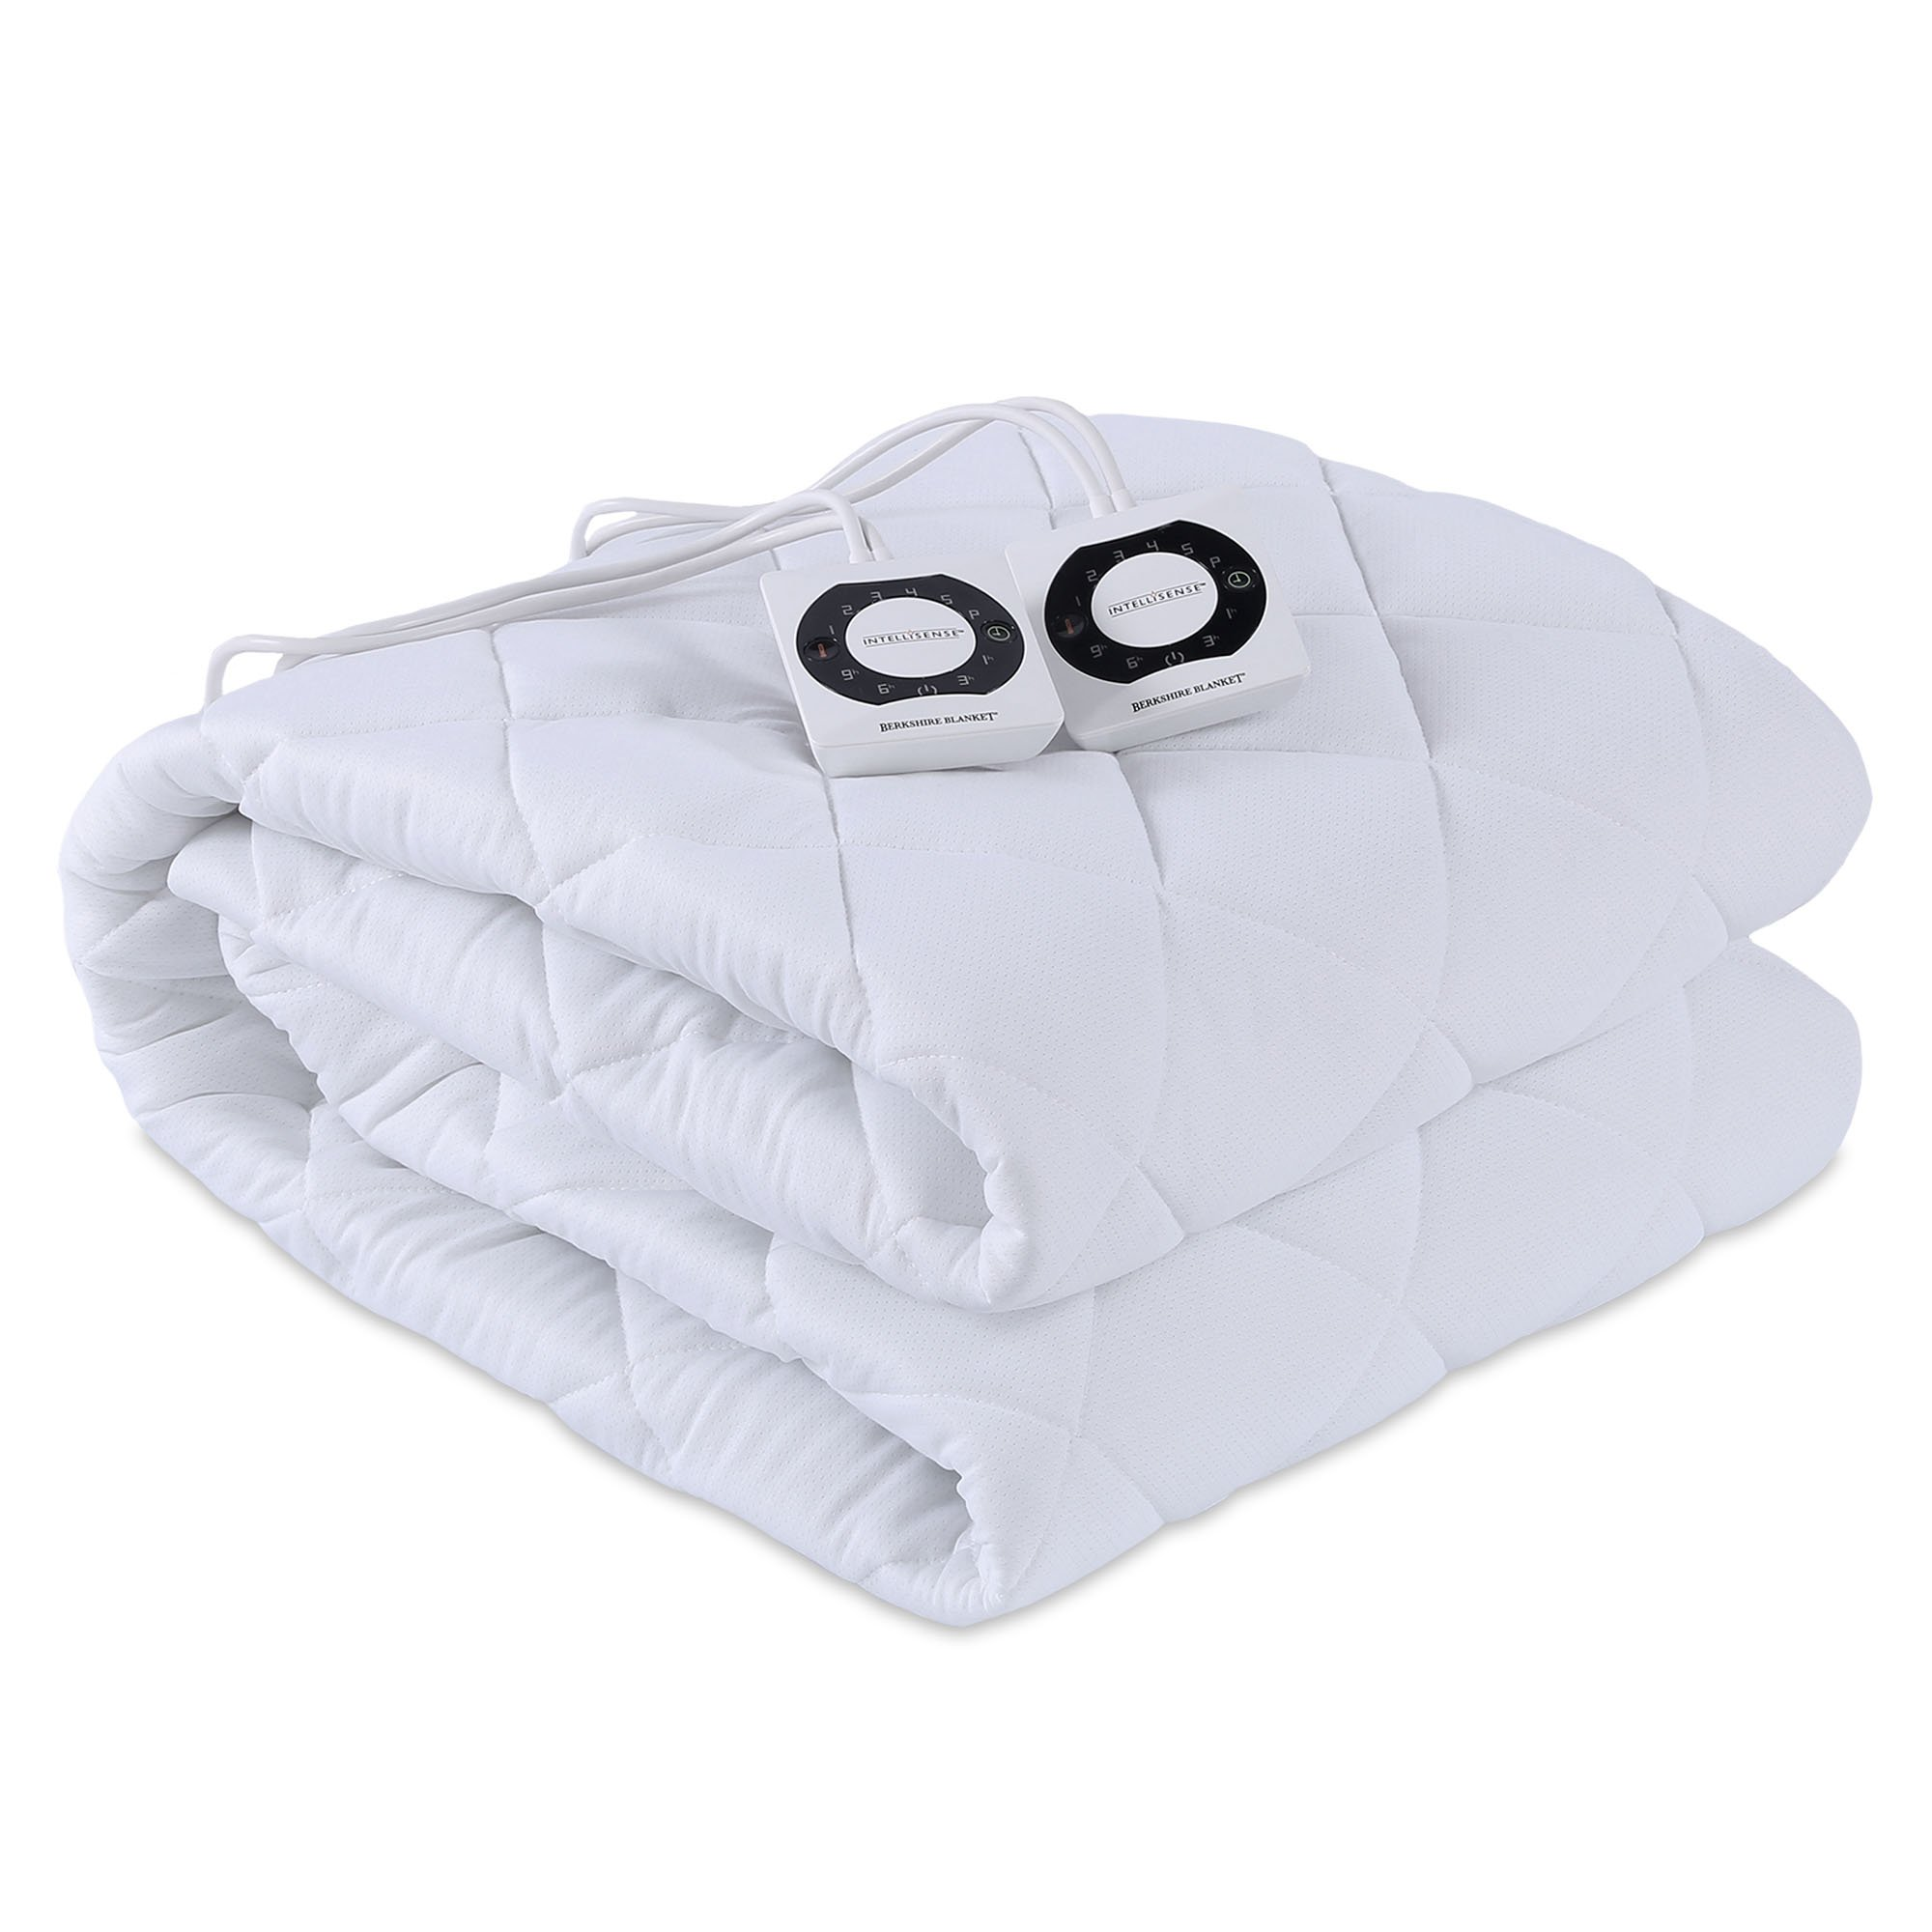 Berkshire Blanket Breathable Mesh Heated Mattress Pad with Intellisense, Full by Berkshire Blanket